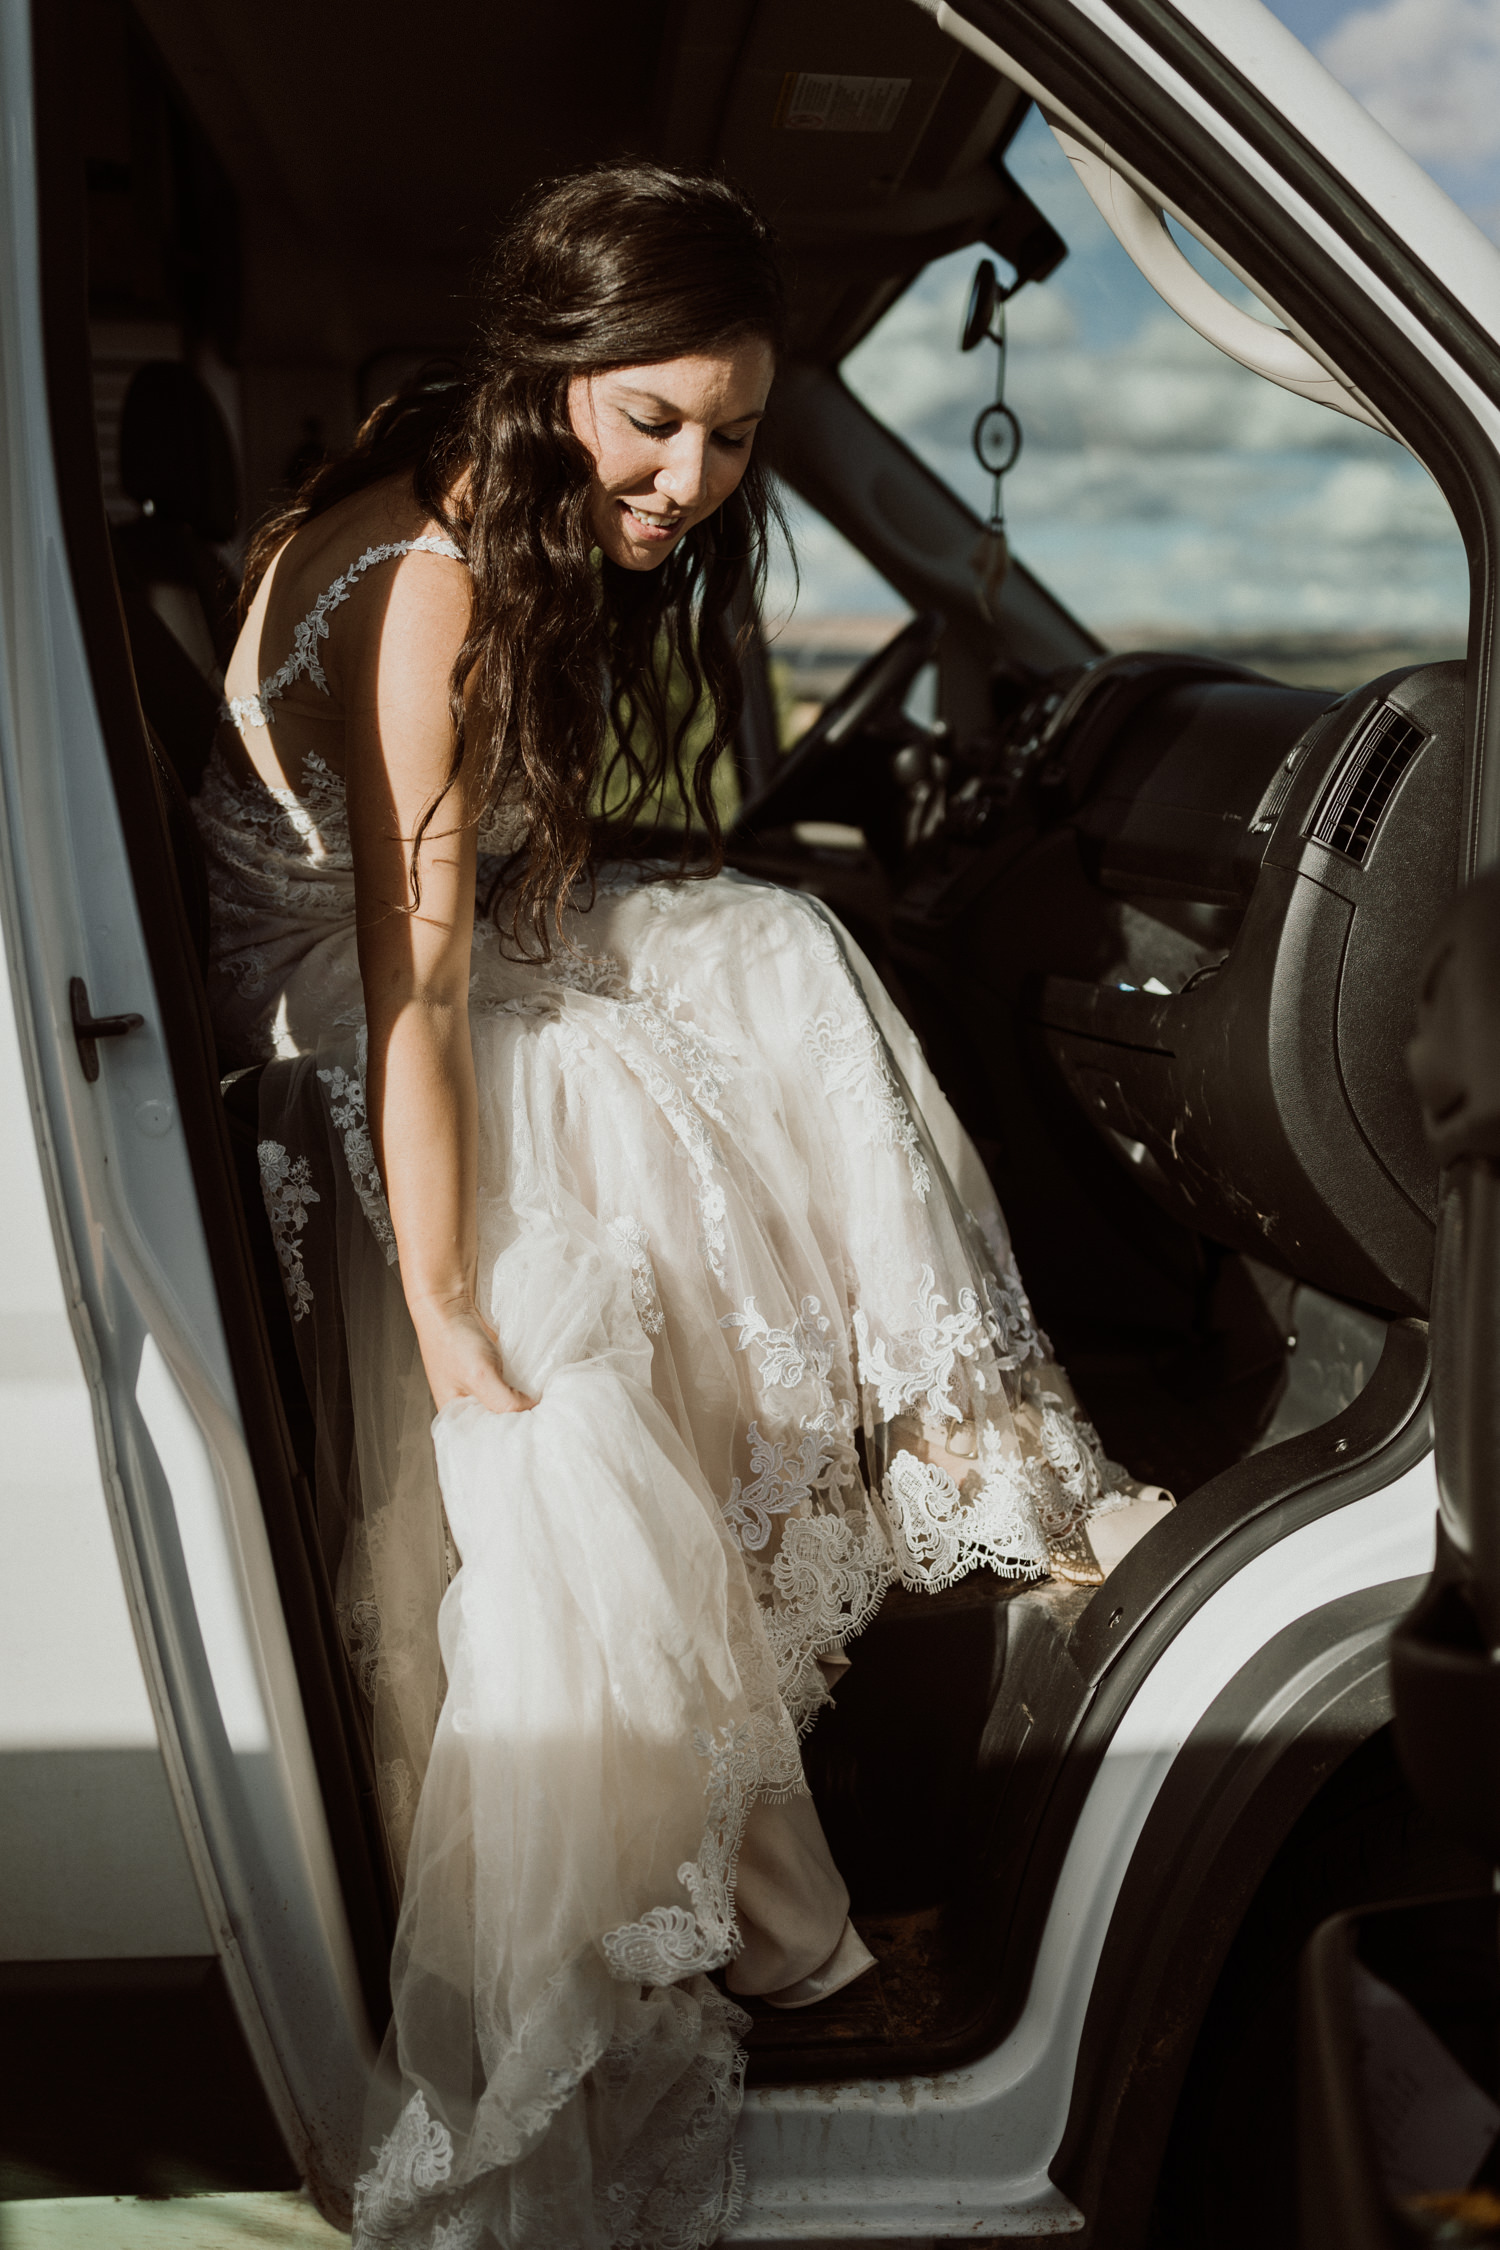 25_moab-utah-elopement-photographer-46.jpg